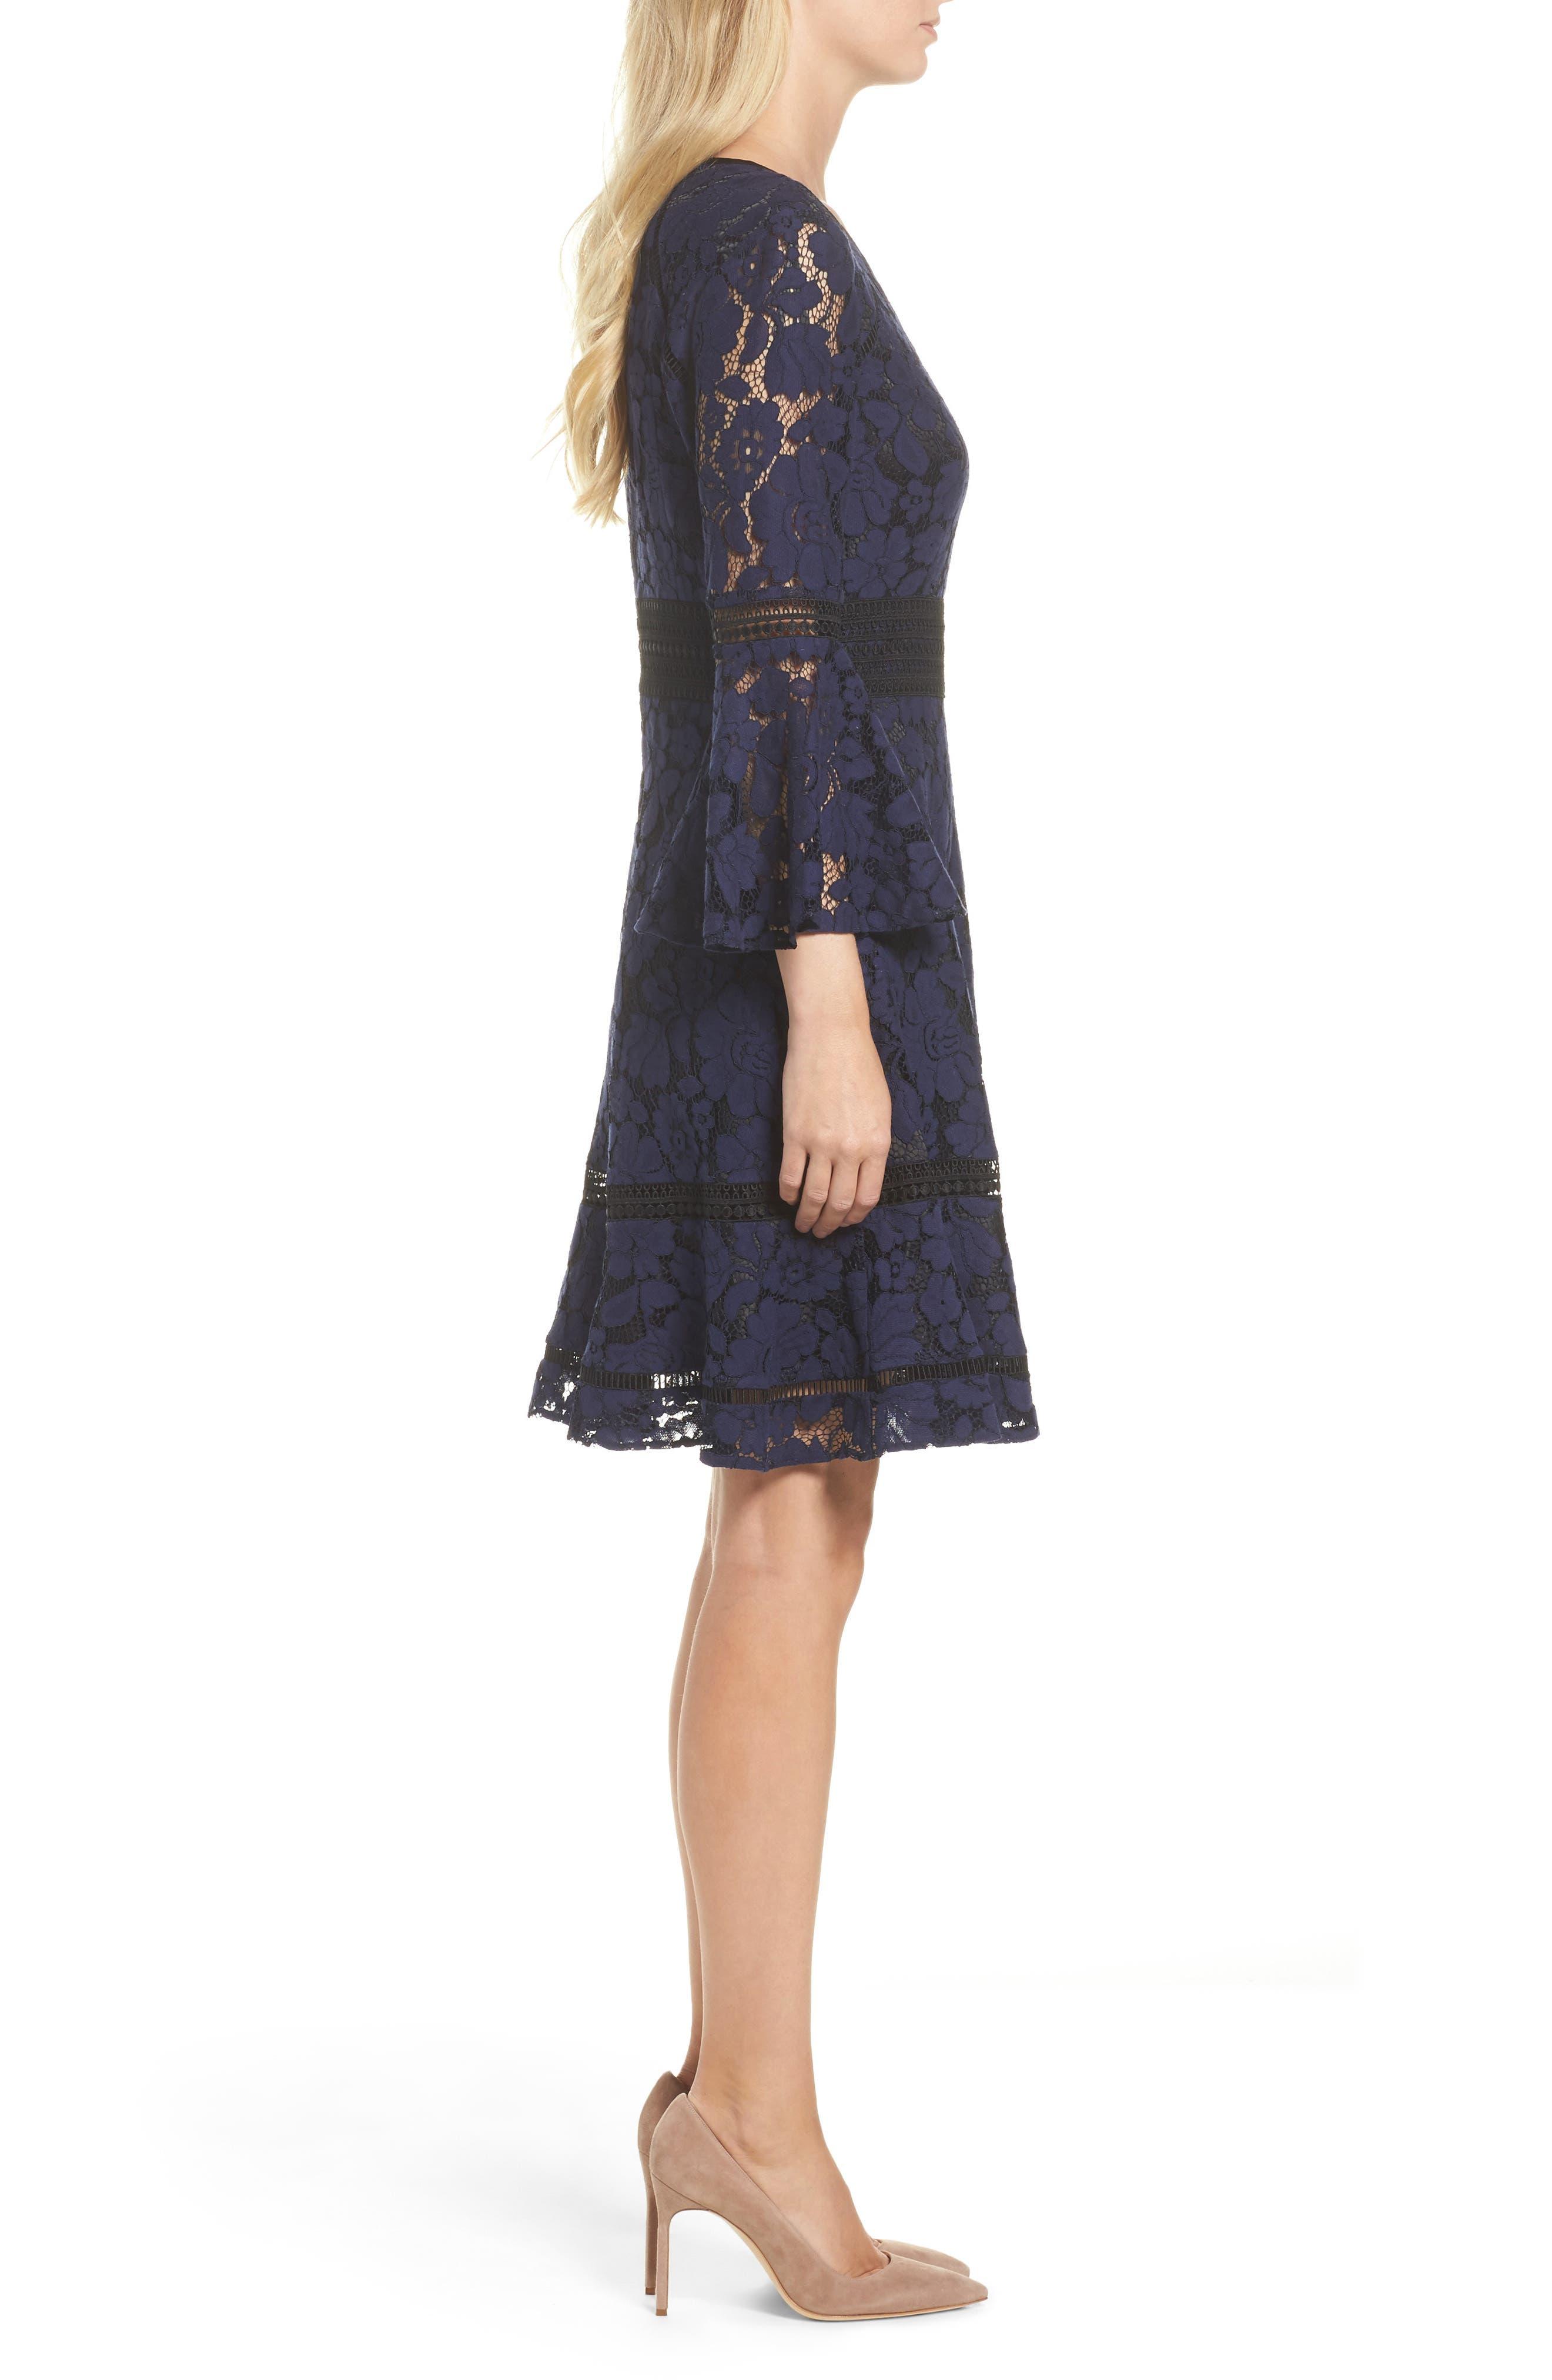 Bell Sleeve Lace Dress,                             Alternate thumbnail 3, color,                             Navy/ Black